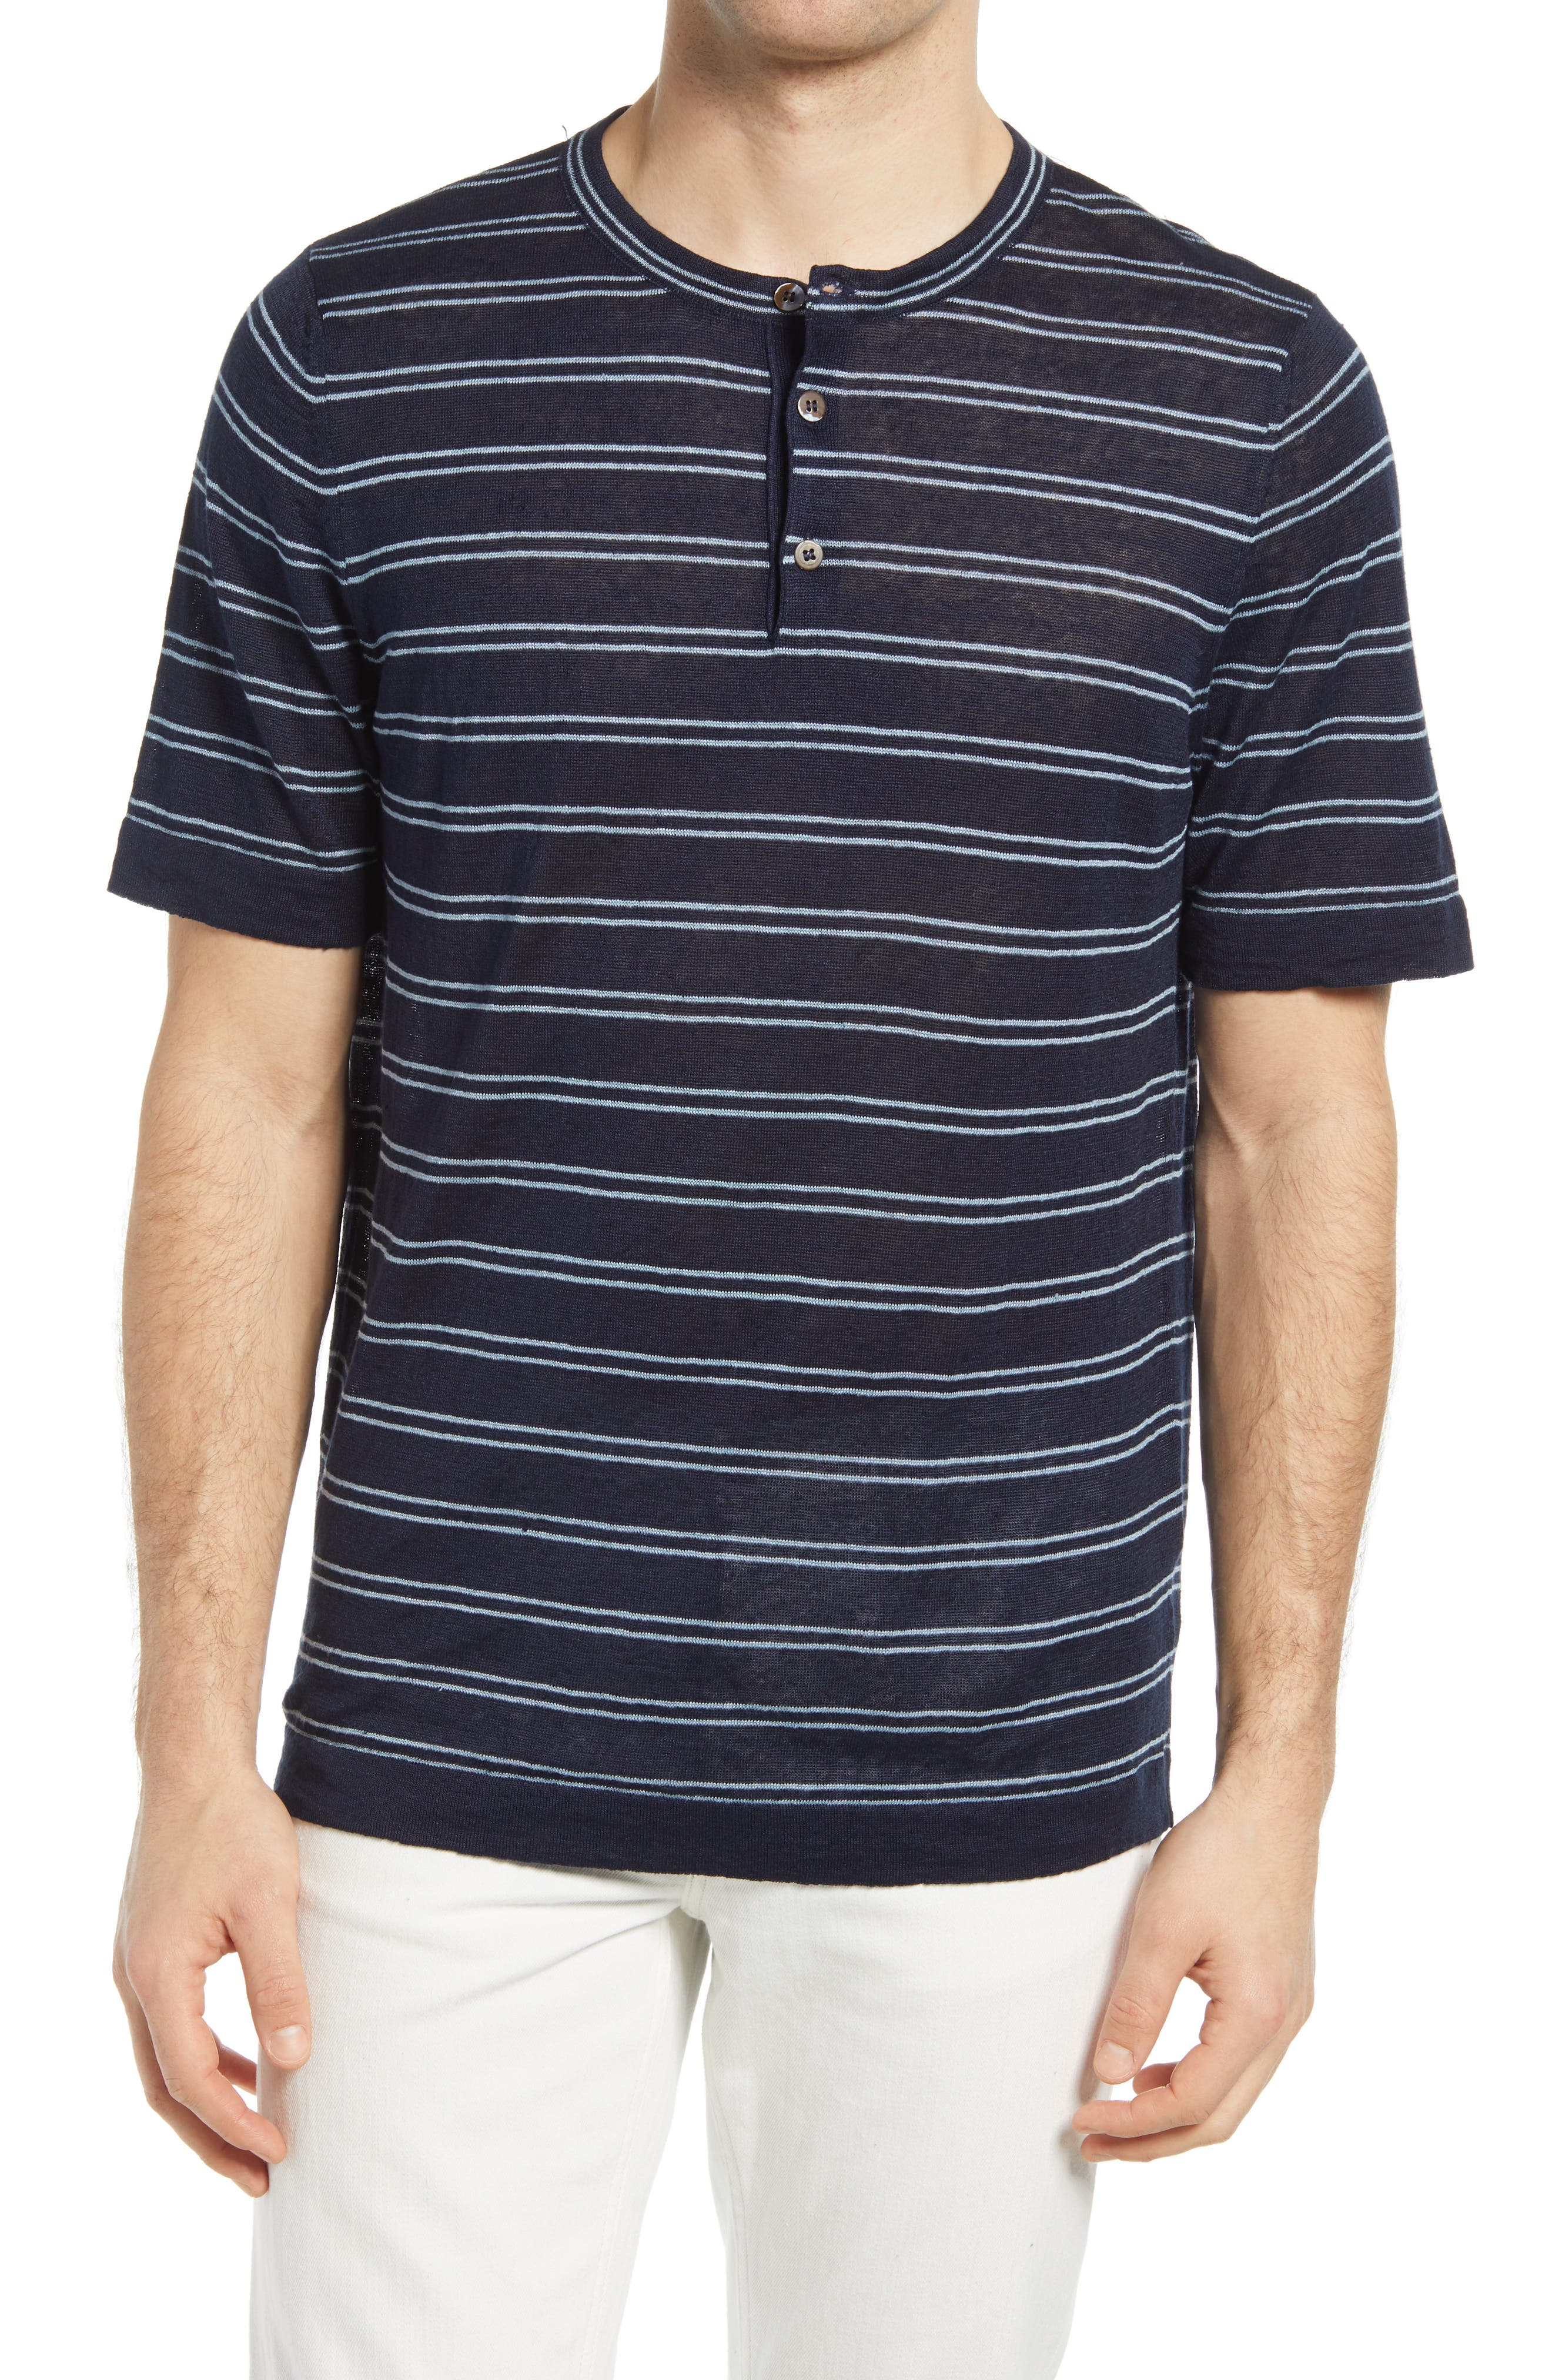 Stripe Linen Short Sleeve Henley